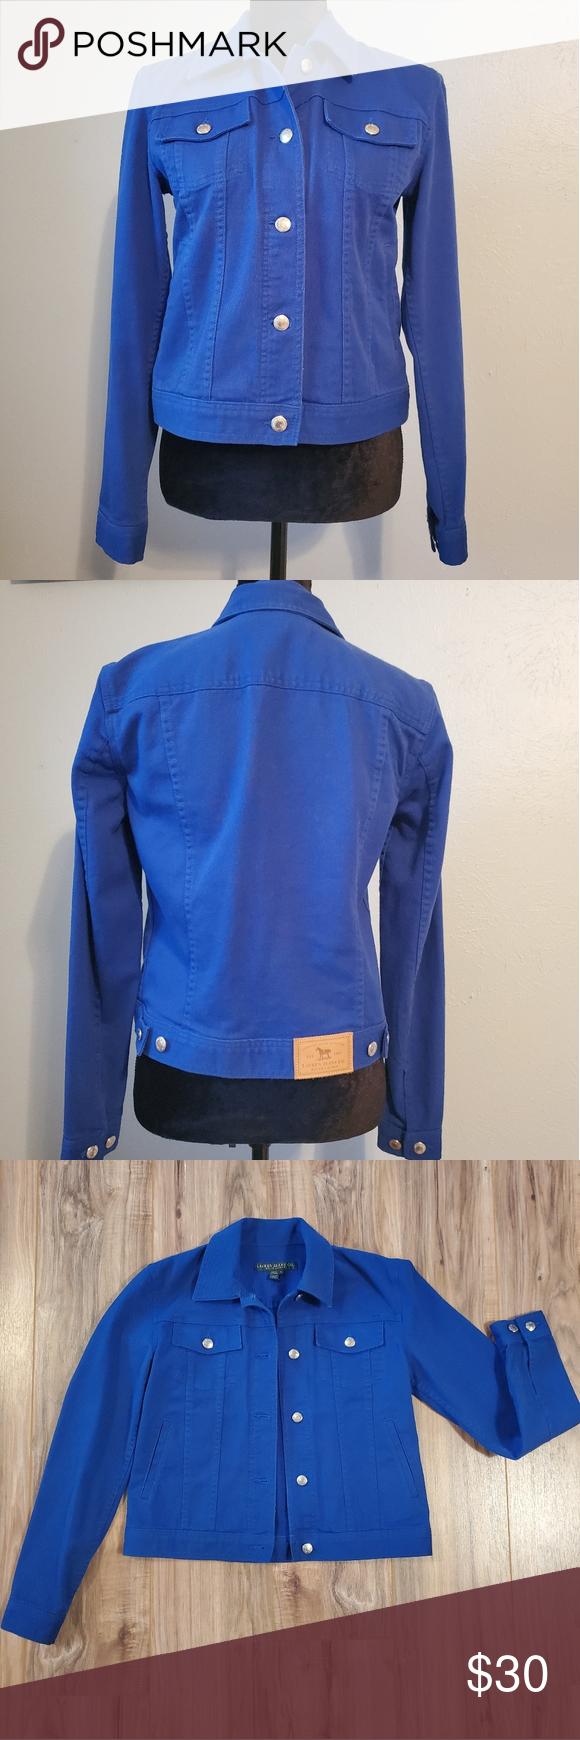 Ralph Lauren Denim Royal Blue Jacket Royal Blue Jacket Ralph Lauren Denim Blue Jacket [ 1740 x 580 Pixel ]